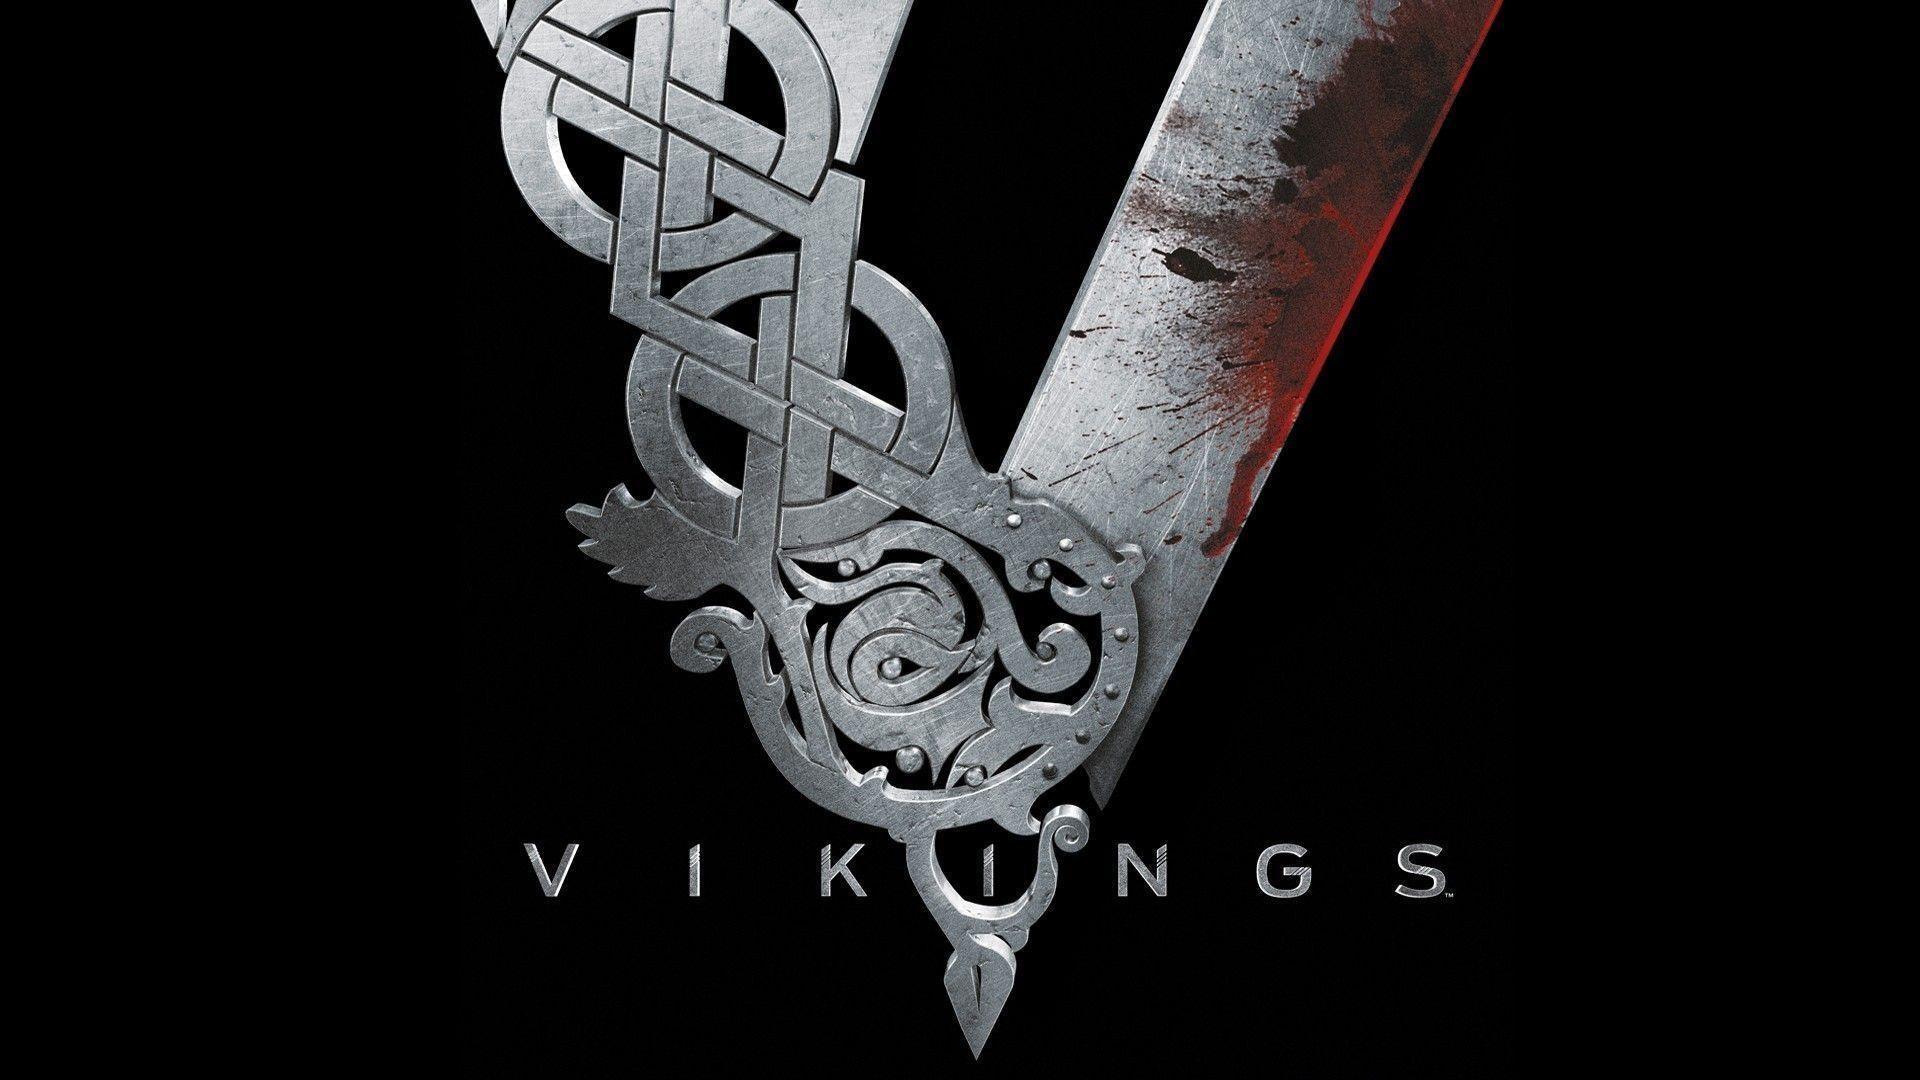 Vikings Windows Background